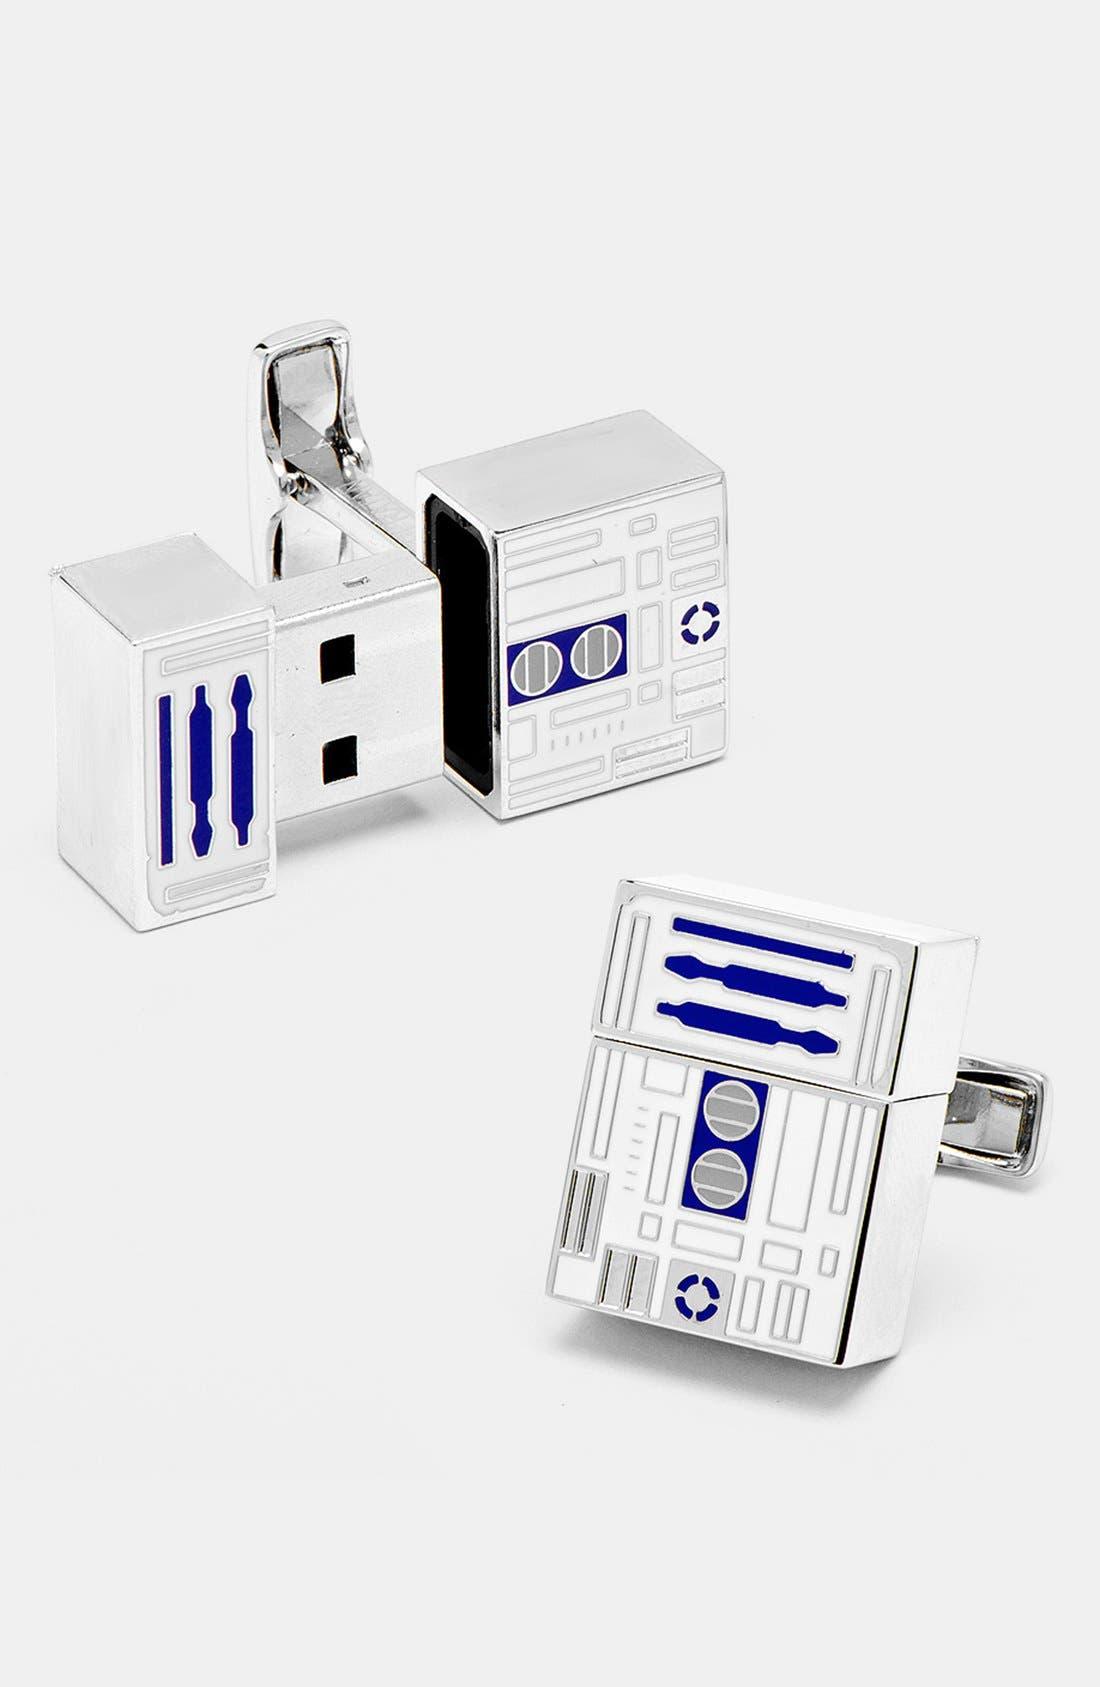 Alternate Image 1 Selected - Cufflinks, Inc. 'Star Wars™ - R2D2' 4GB Flash Drive Cuff Links